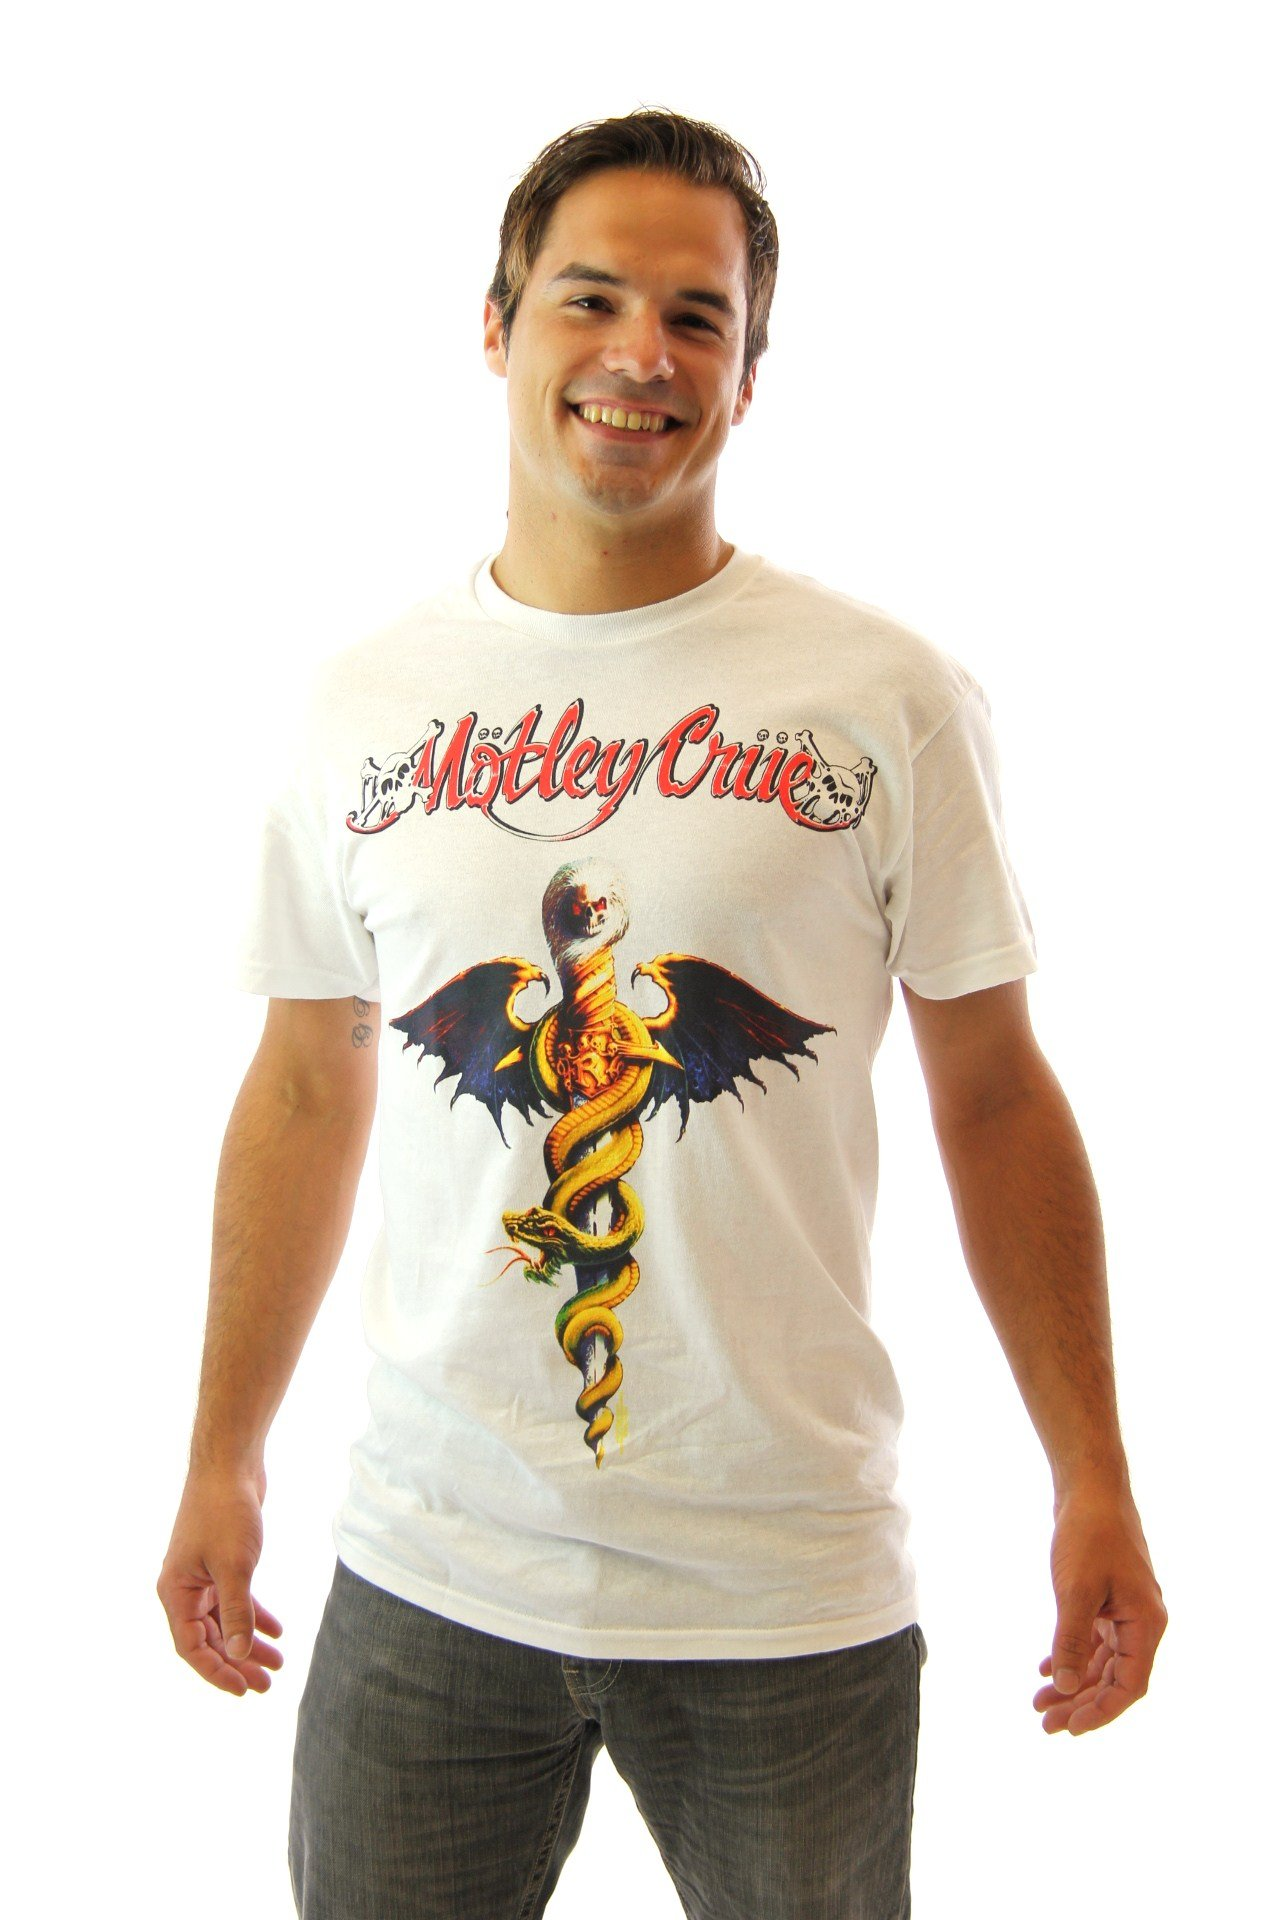 Waynes World Motley Crue Band Logo Adult Shirts